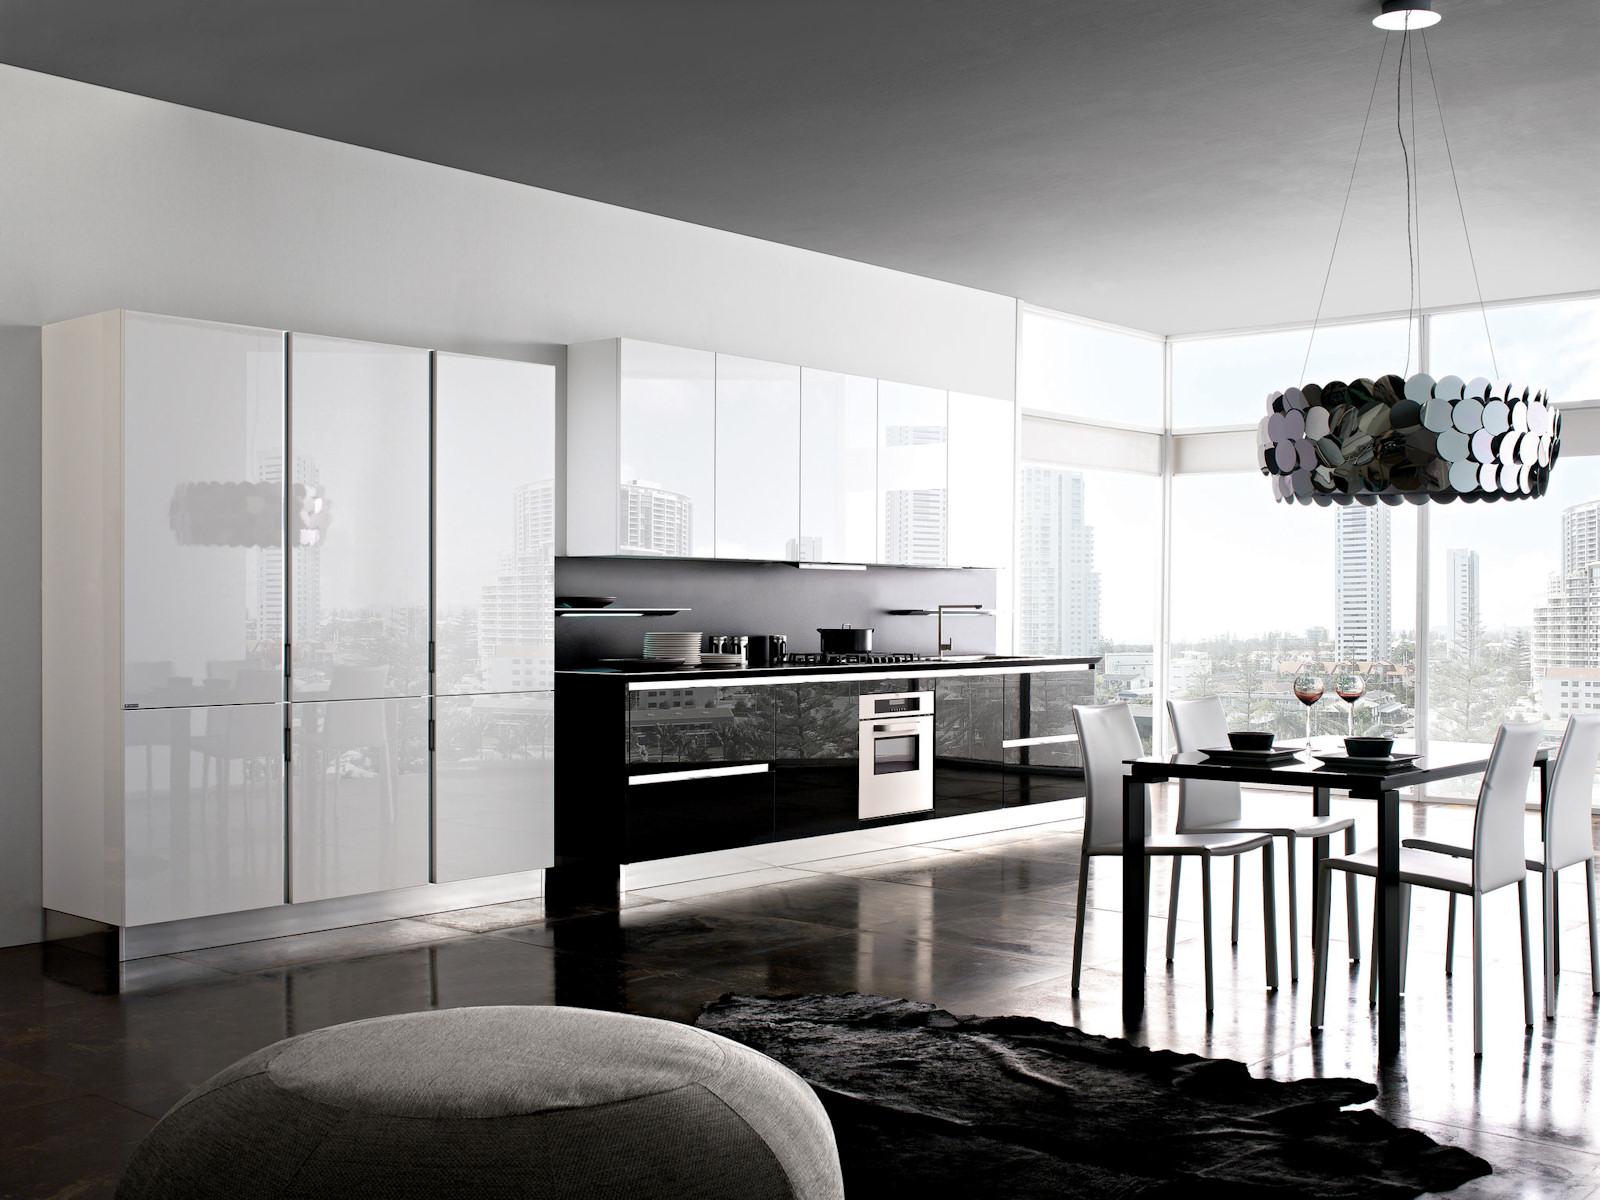 Cucina moderna laccata lucida - Mariani Arreda